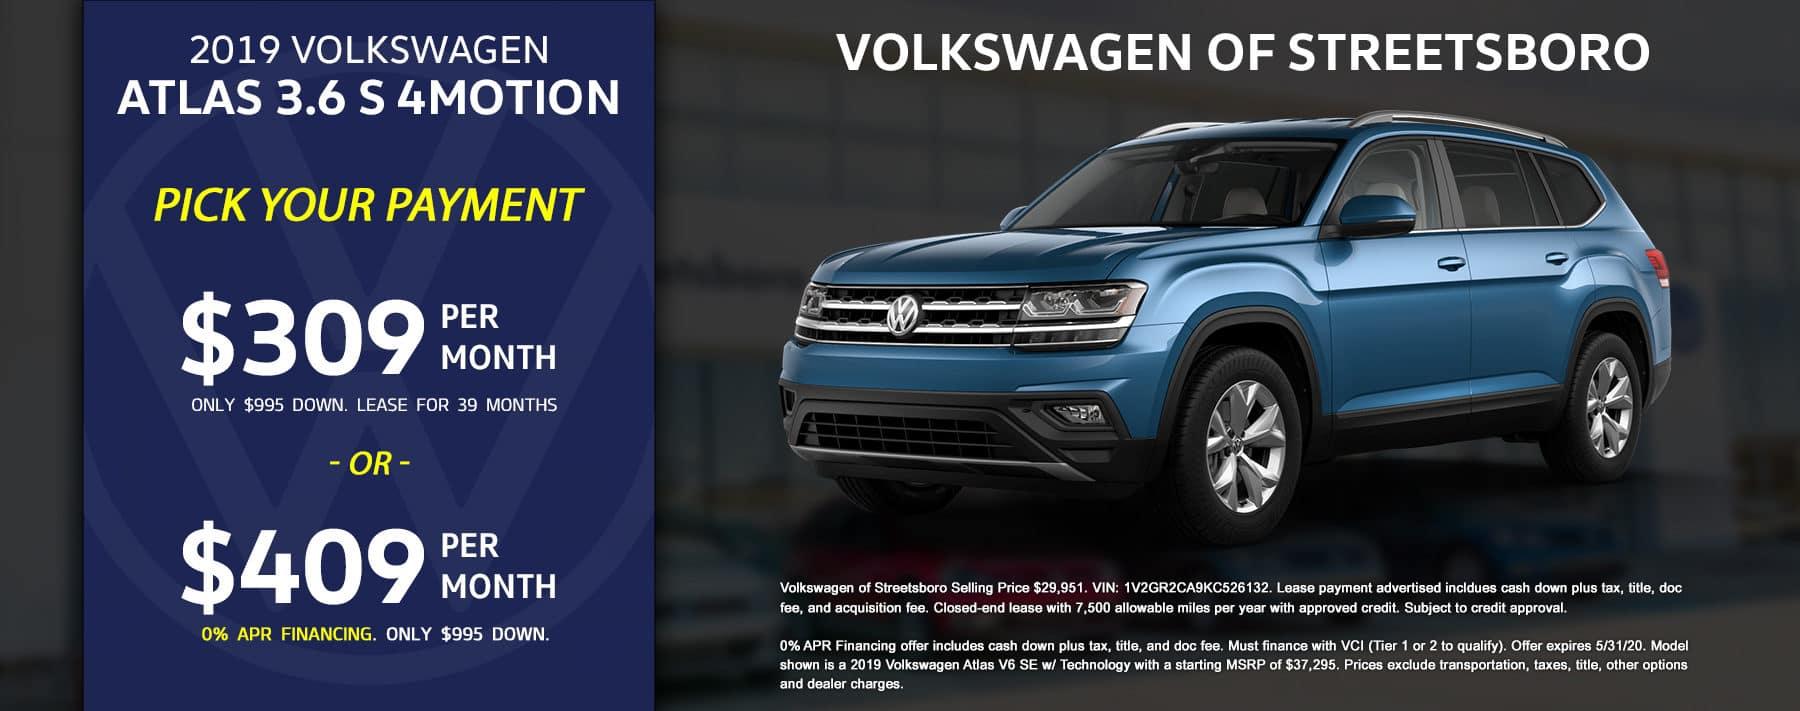 2019 VW Atlas - May 2020